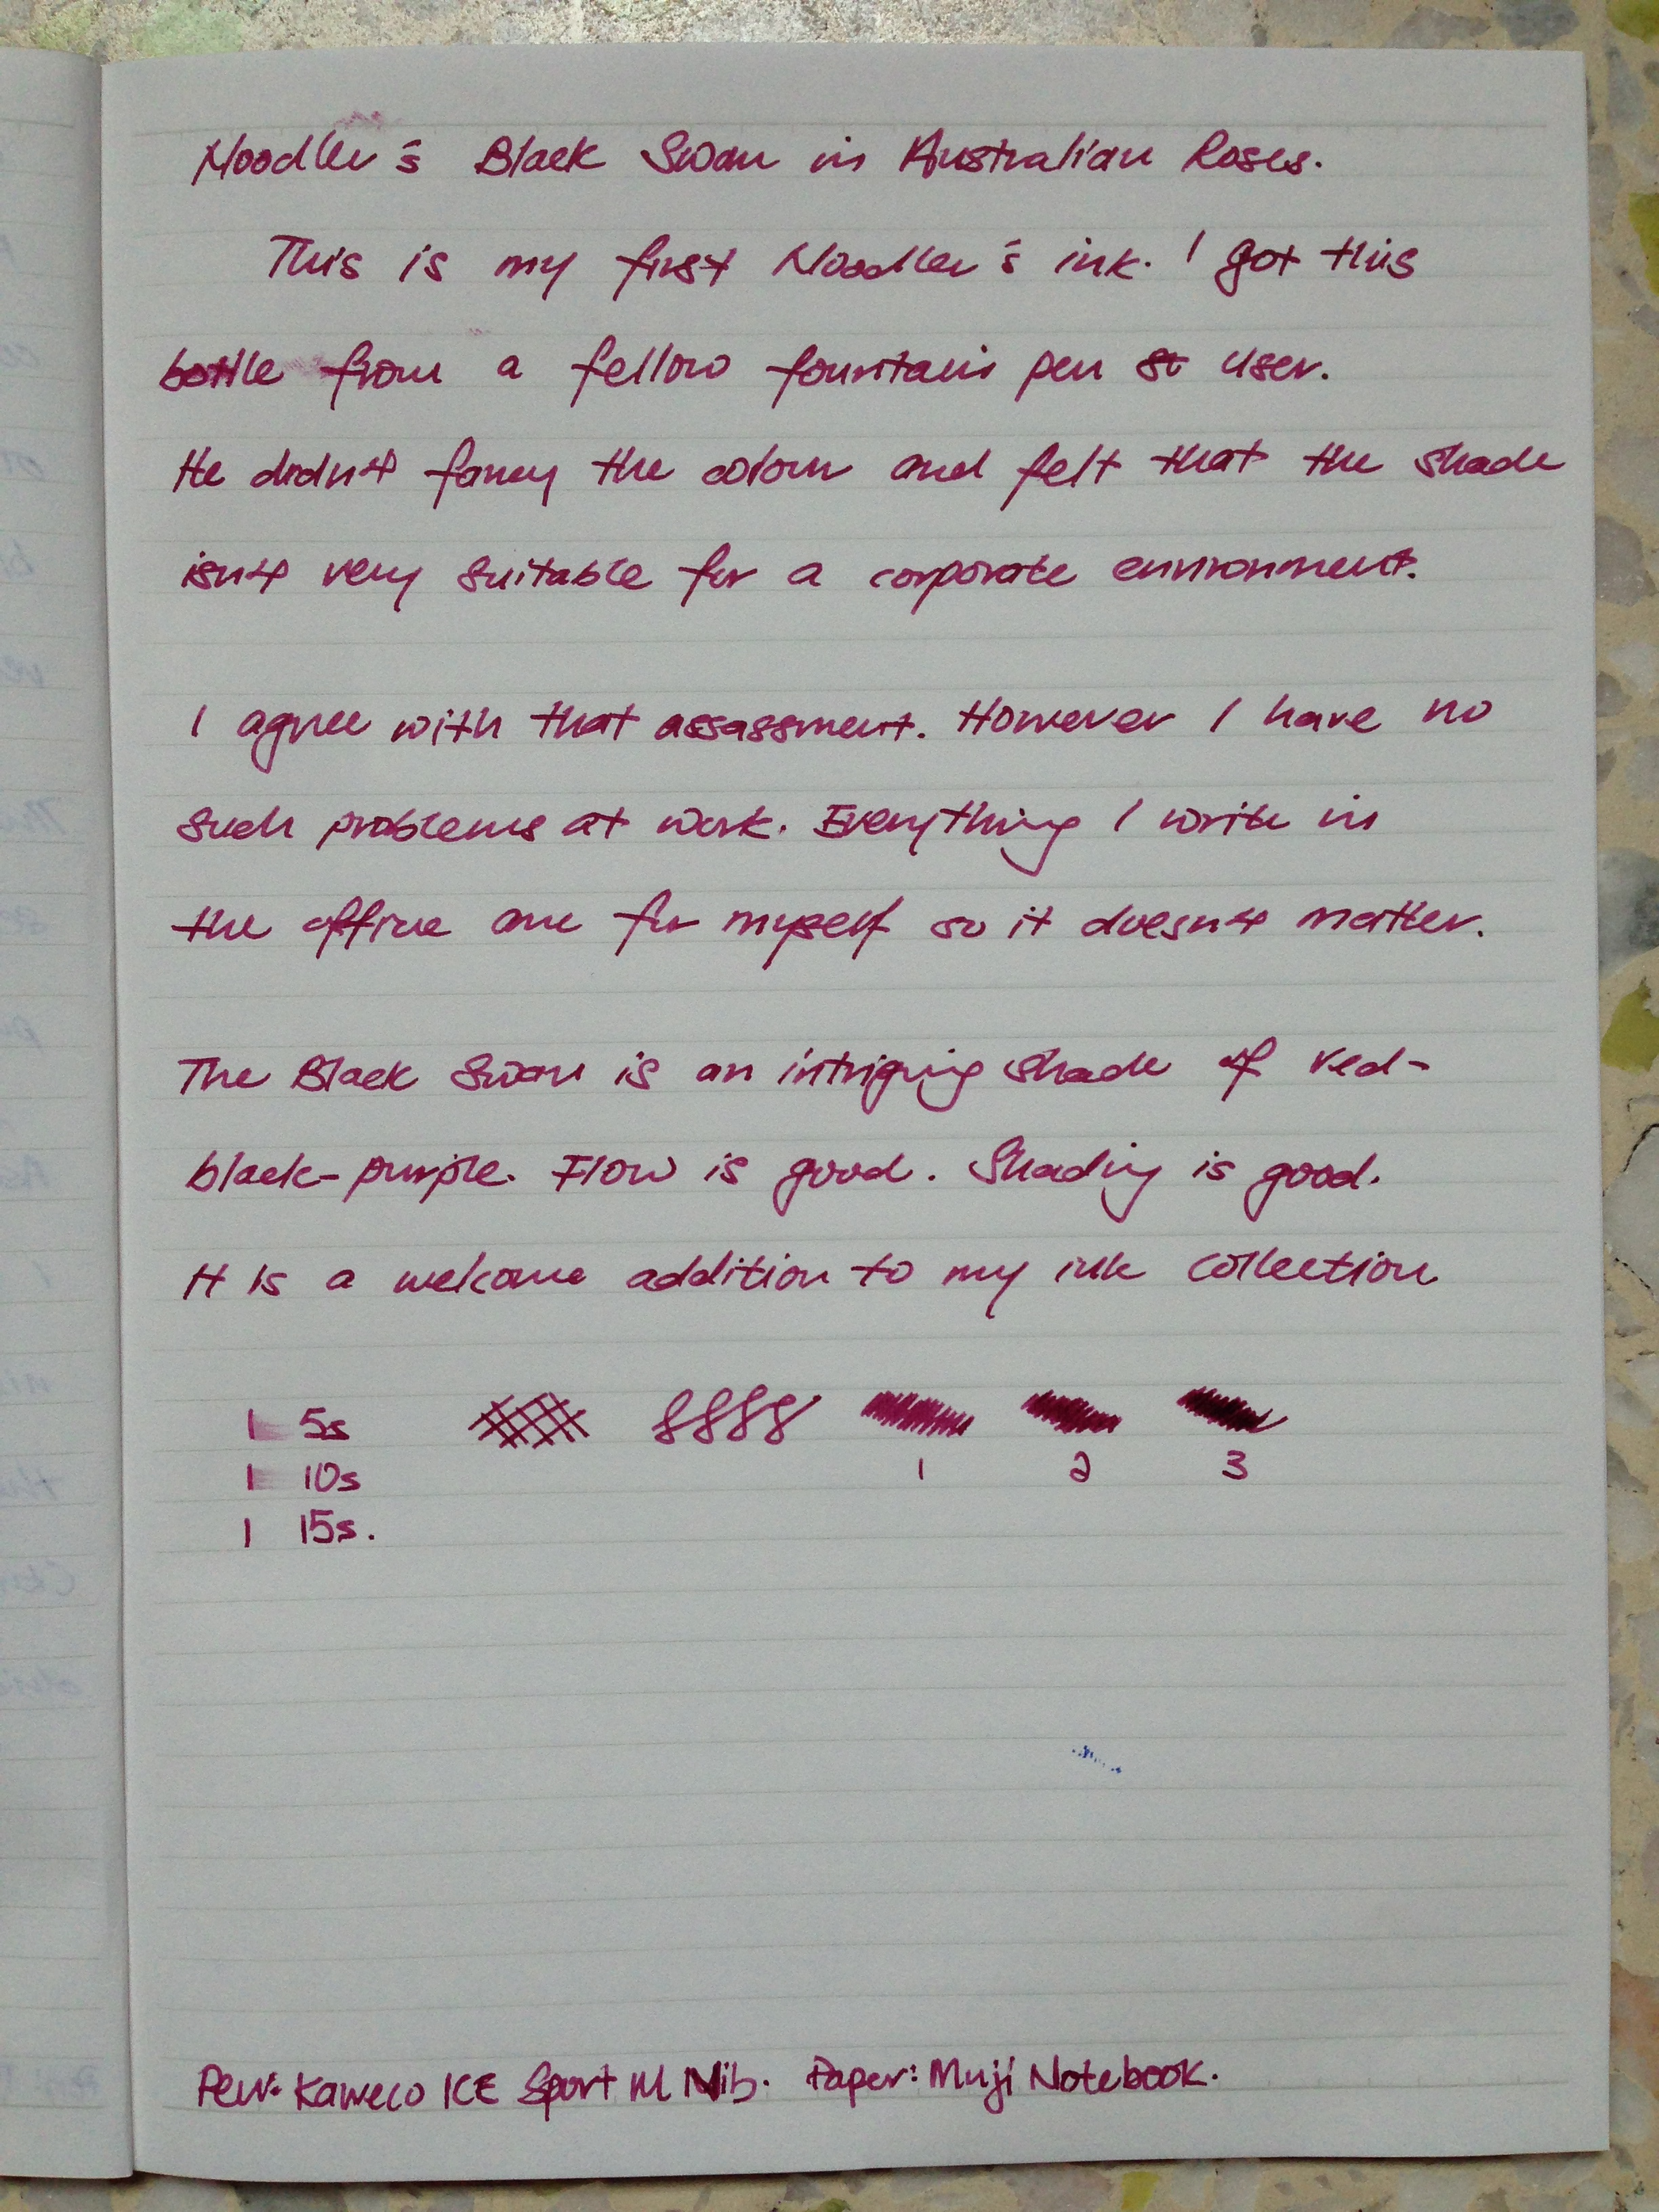 Written review of Noodler's Black Swan in Australian Roses